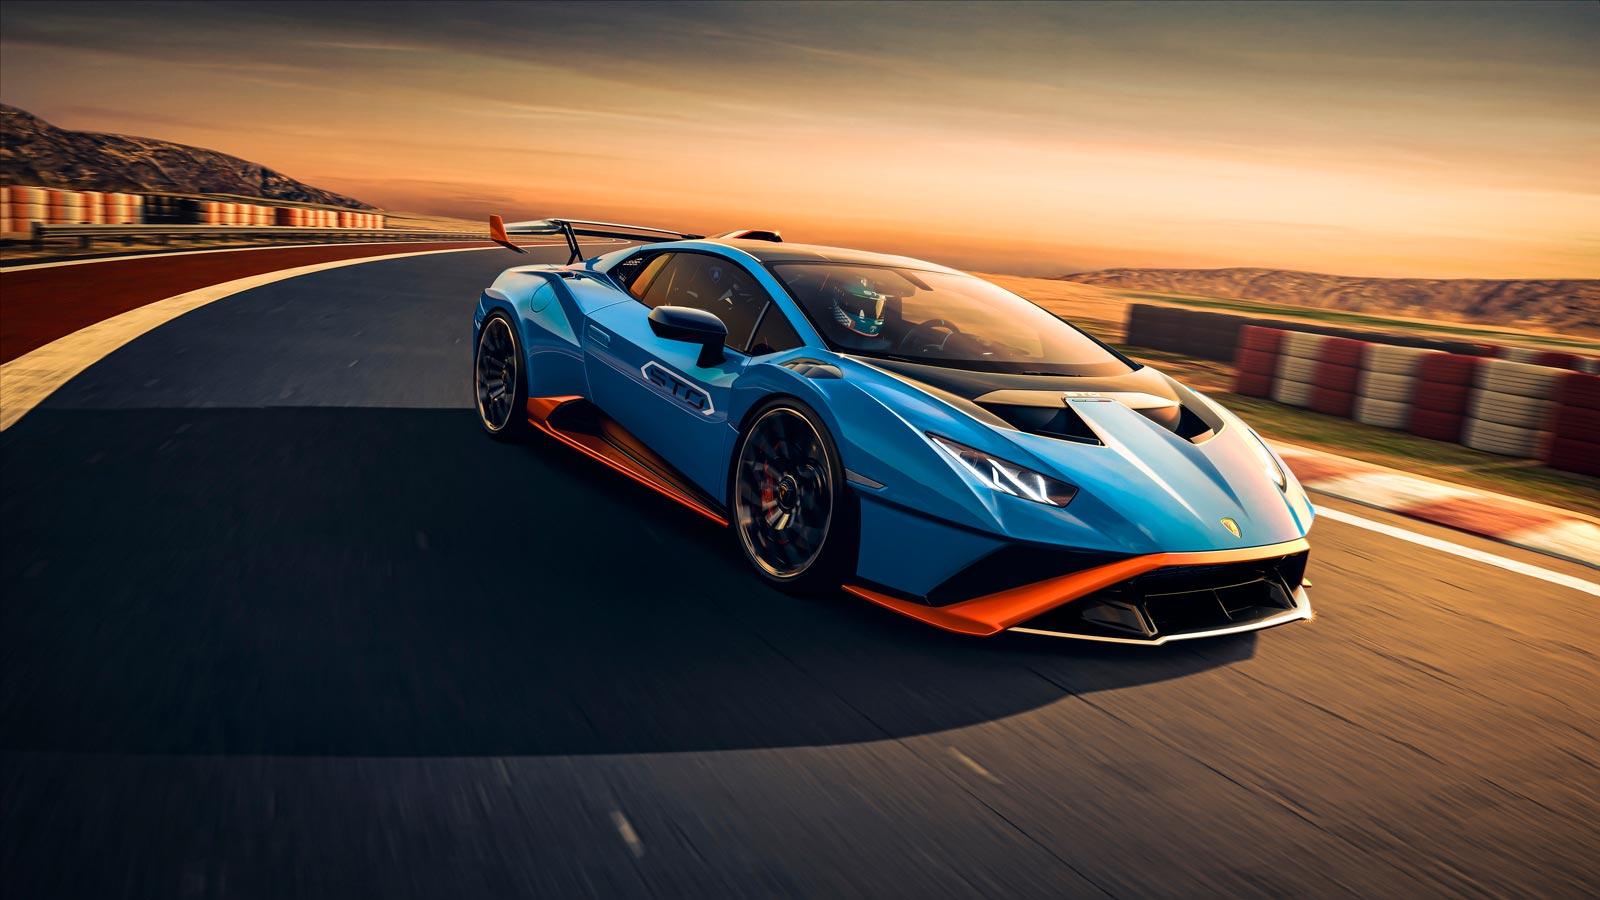 Lamborghini Huracan STO - From racetrack to road image 12